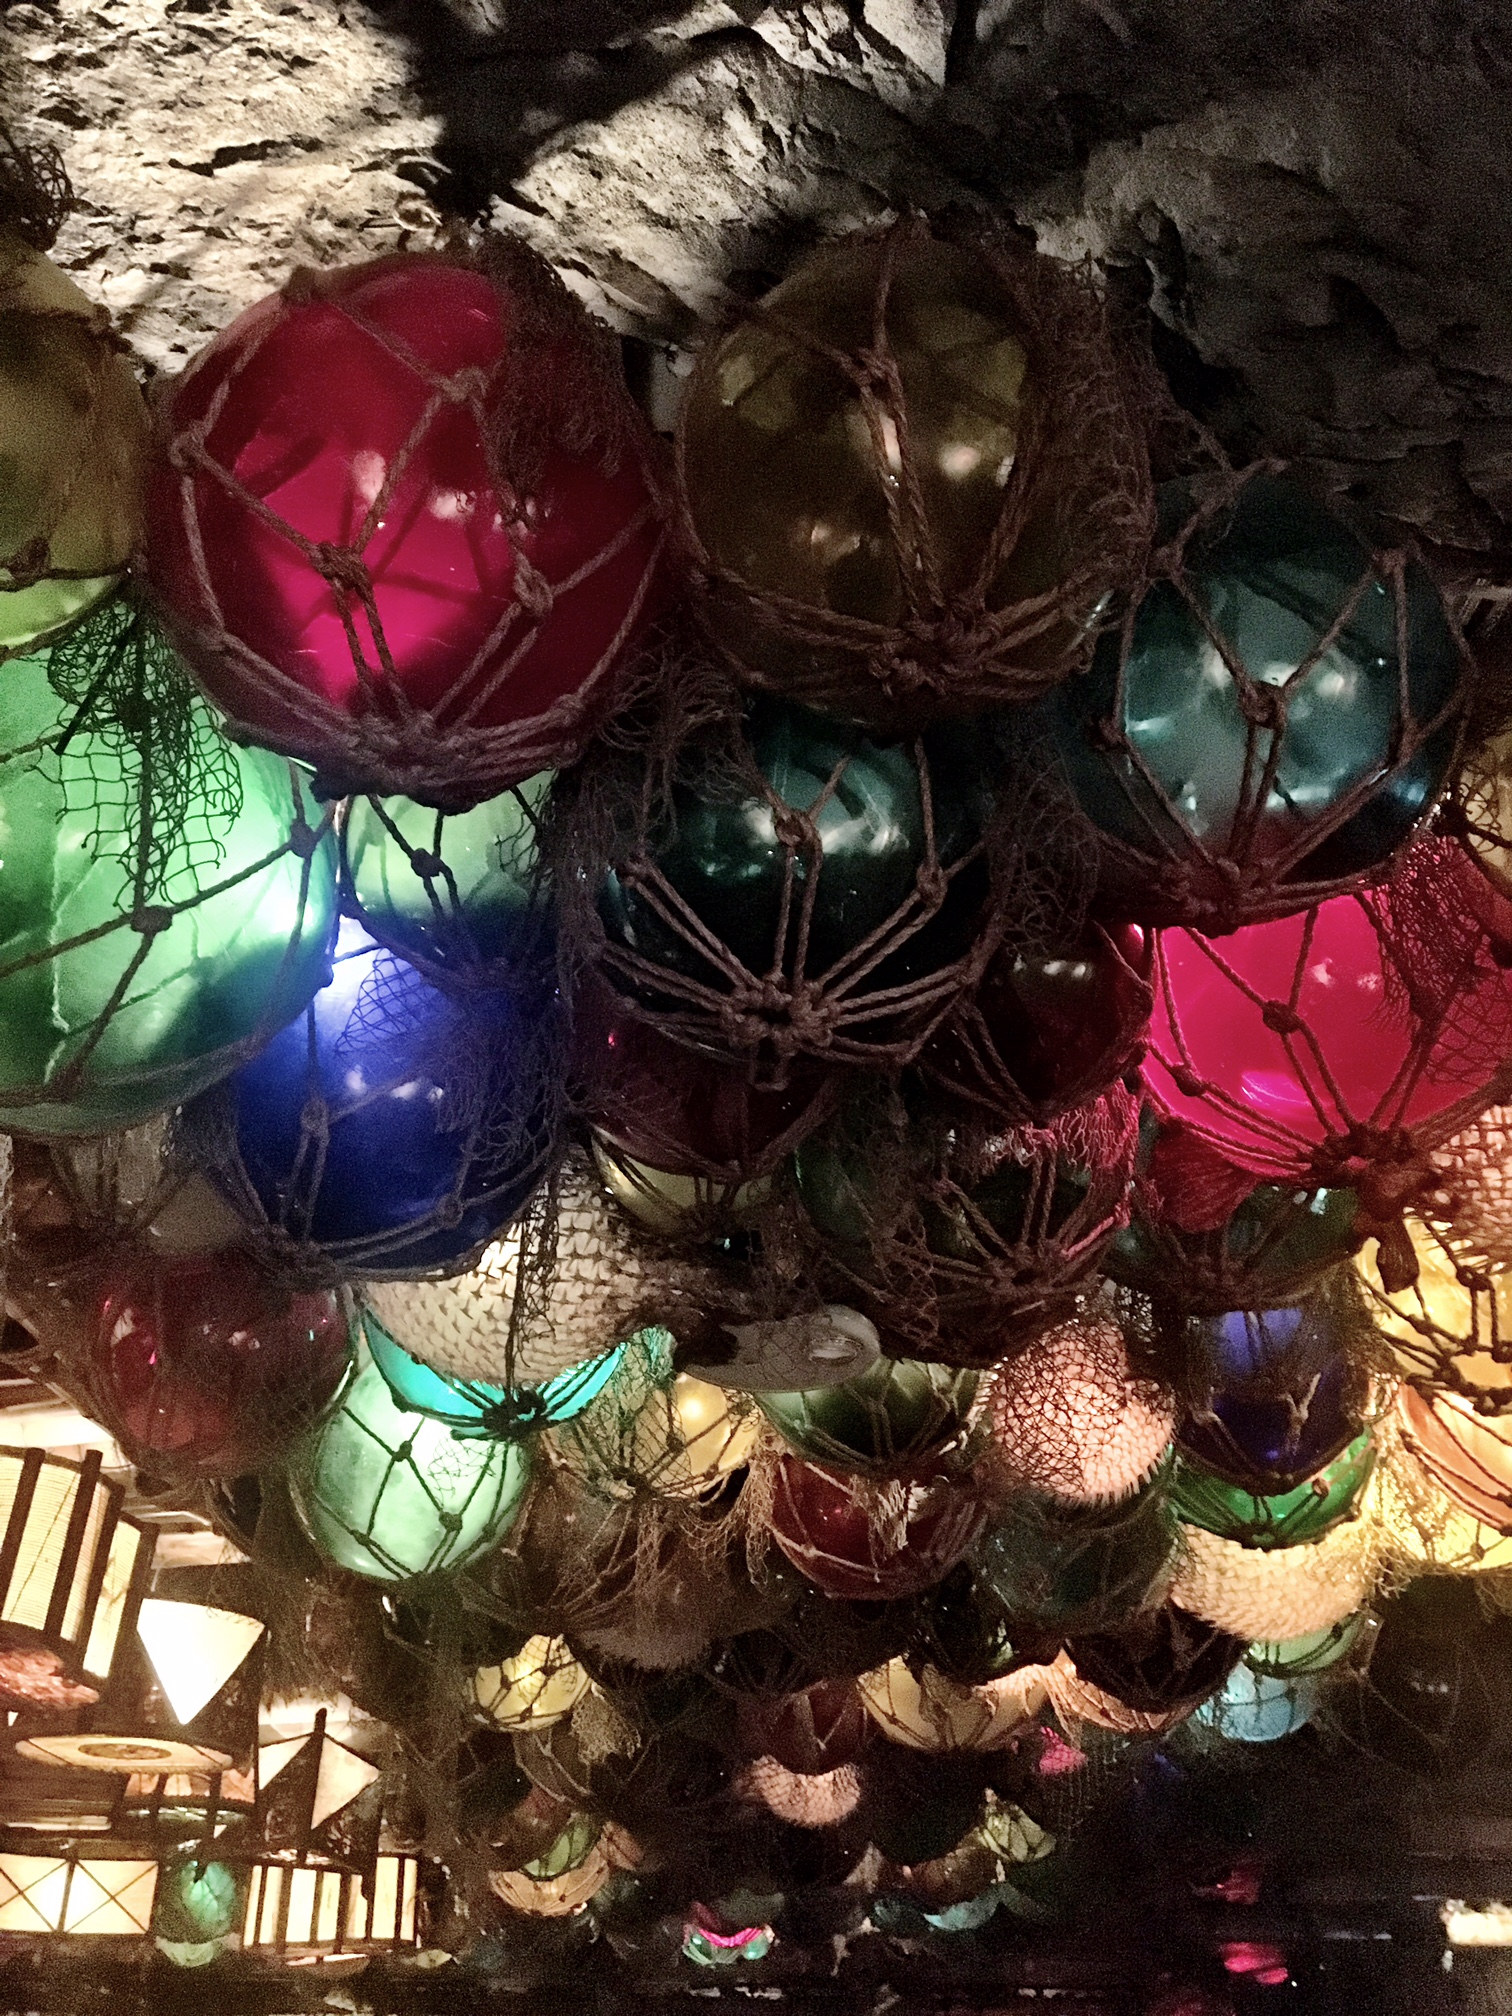 tiki decor at False Idol Tiki Bar, San Diego